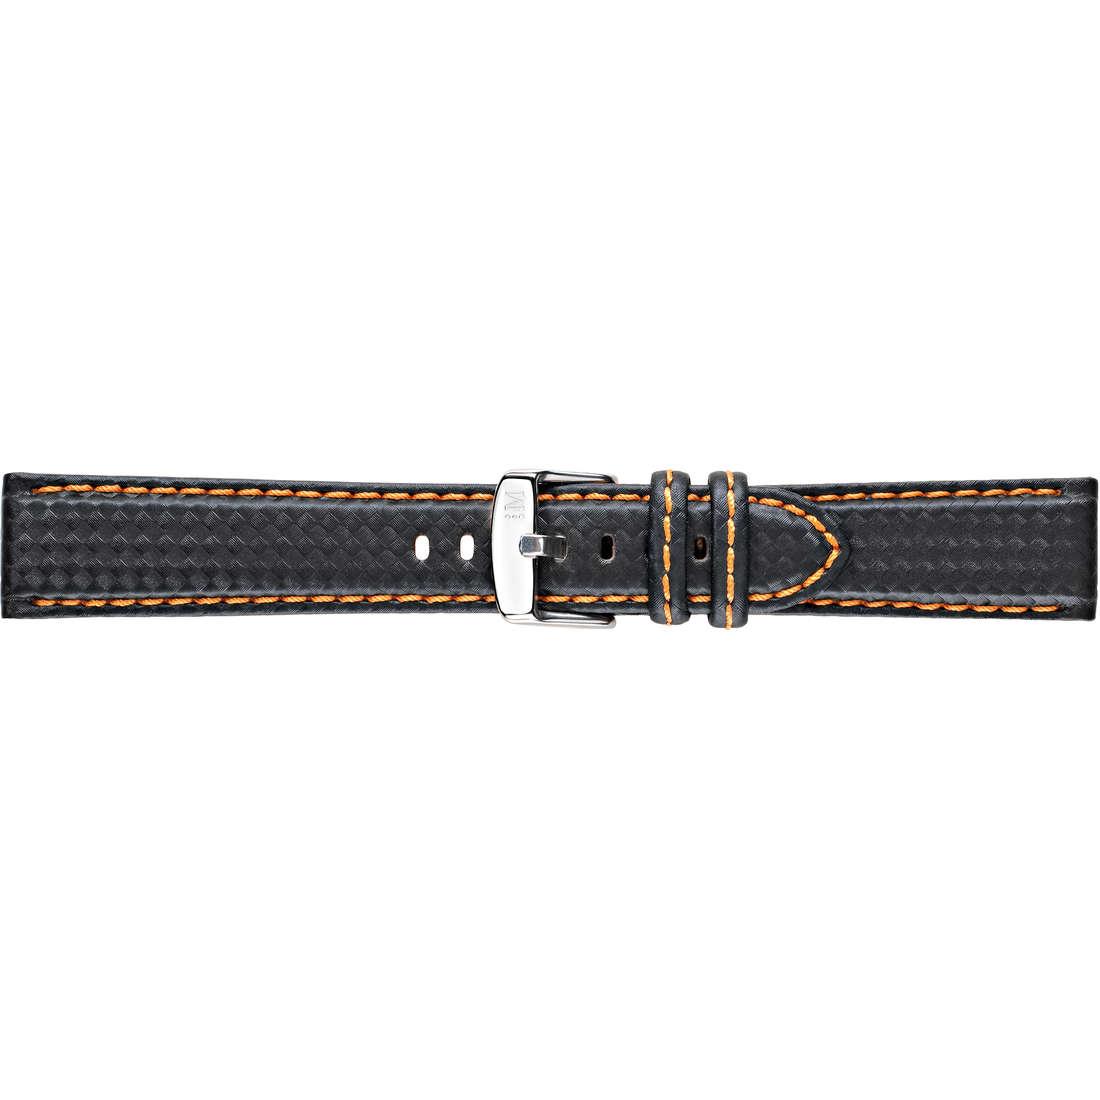 montre bande de montres homme Morellato Linea Sport A01U3586977886CR18